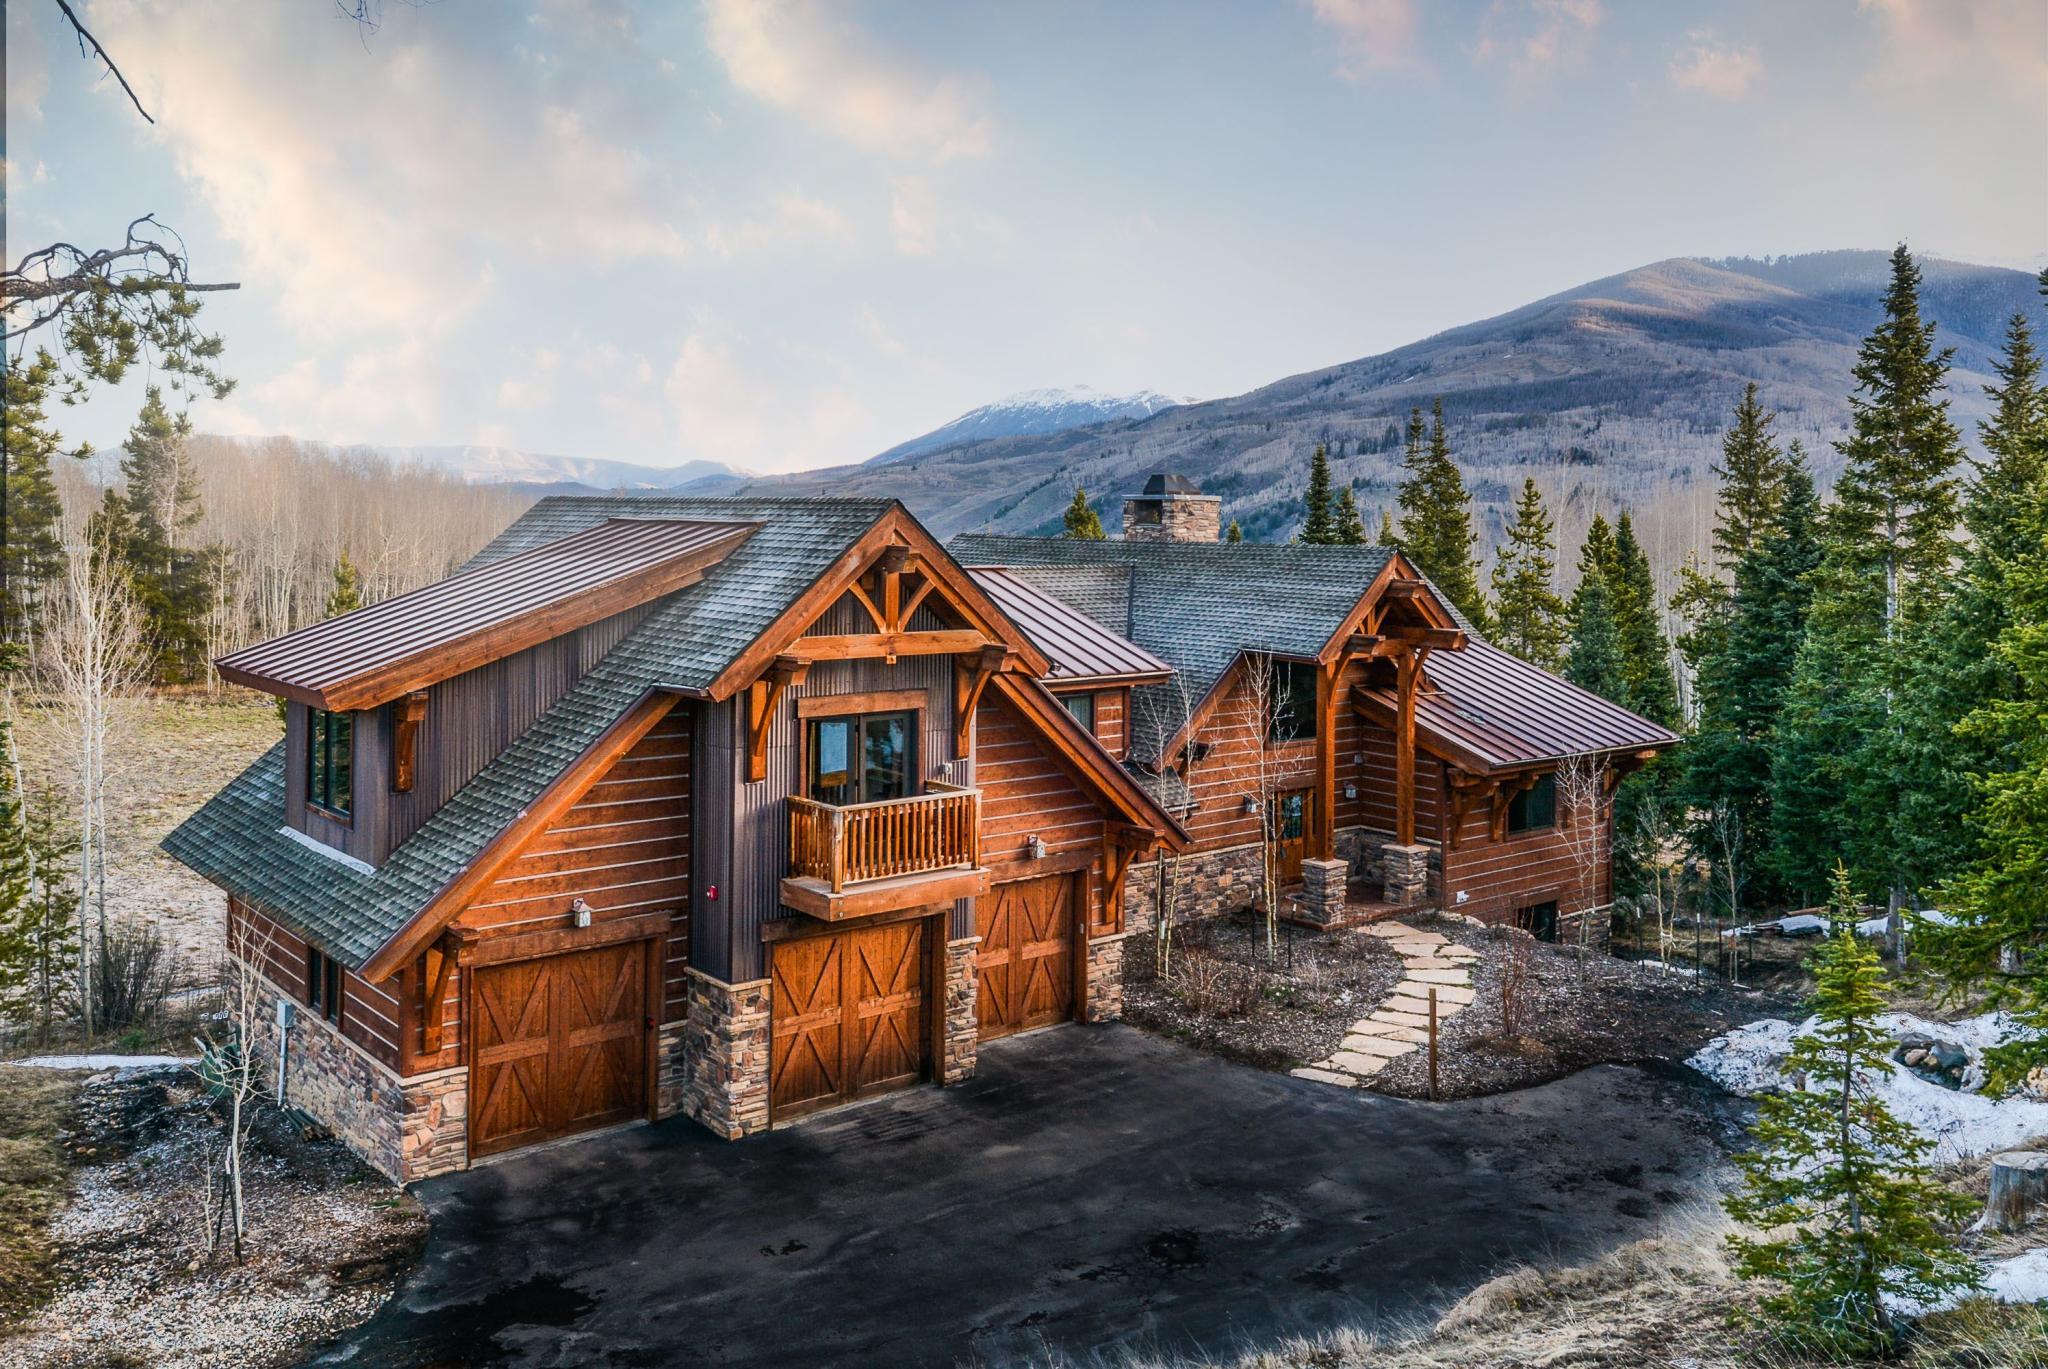 stunning log home wetterhorn sale for uber cabins homes decor colorado trail in peak